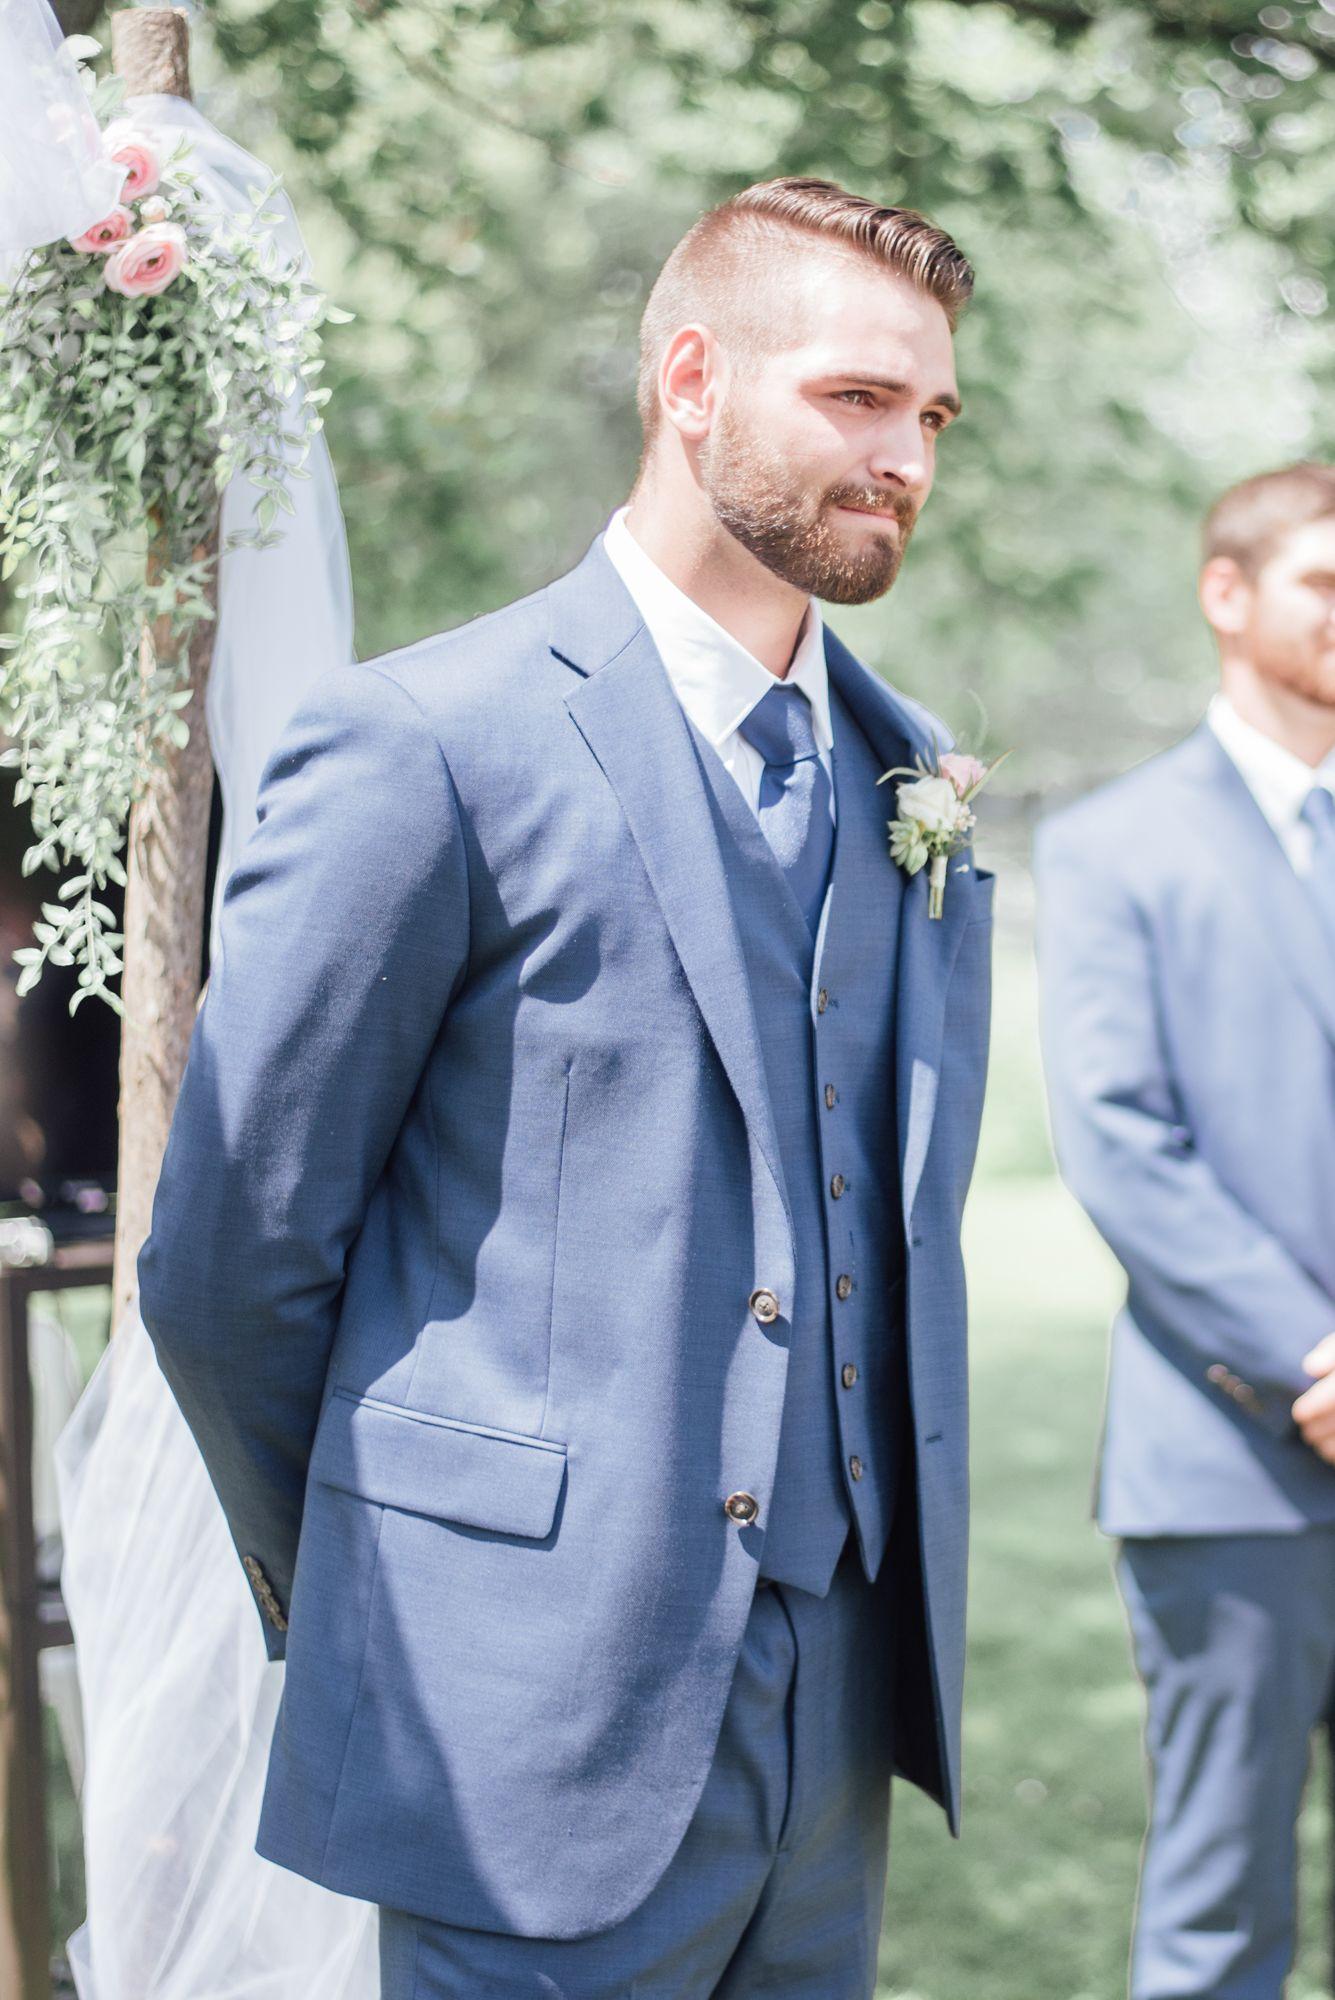 Rueb Wedding | Groom reaction, Photographers and Photography